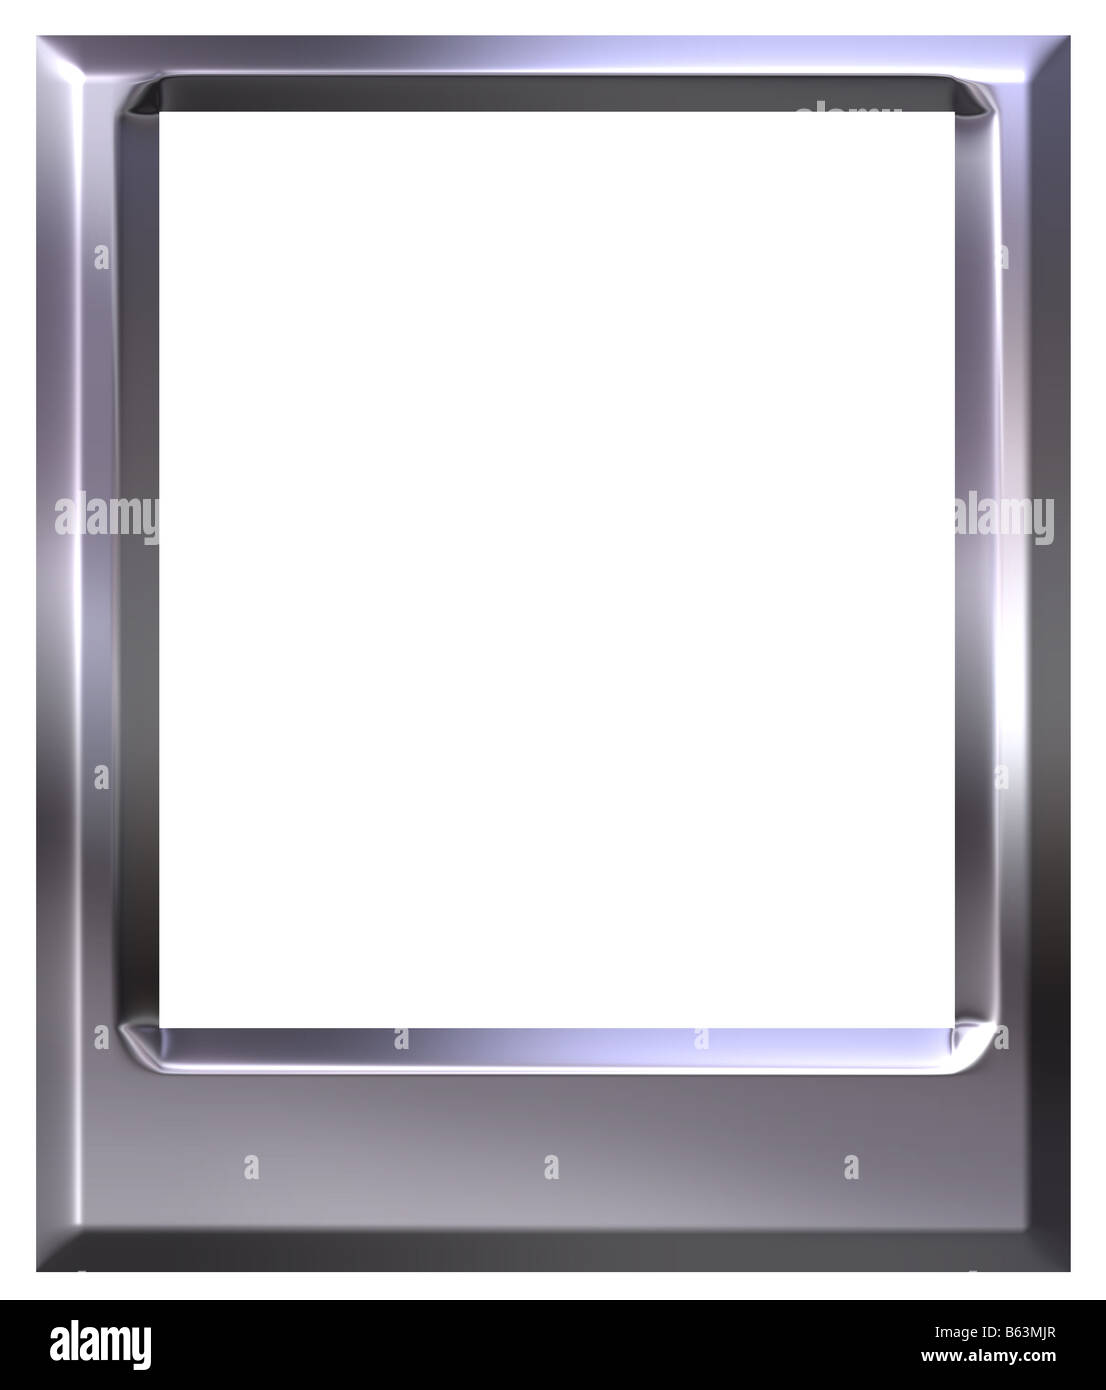 Marco de fotos de plata en 3D Foto & Imagen De Stock: 20980367 - Alamy